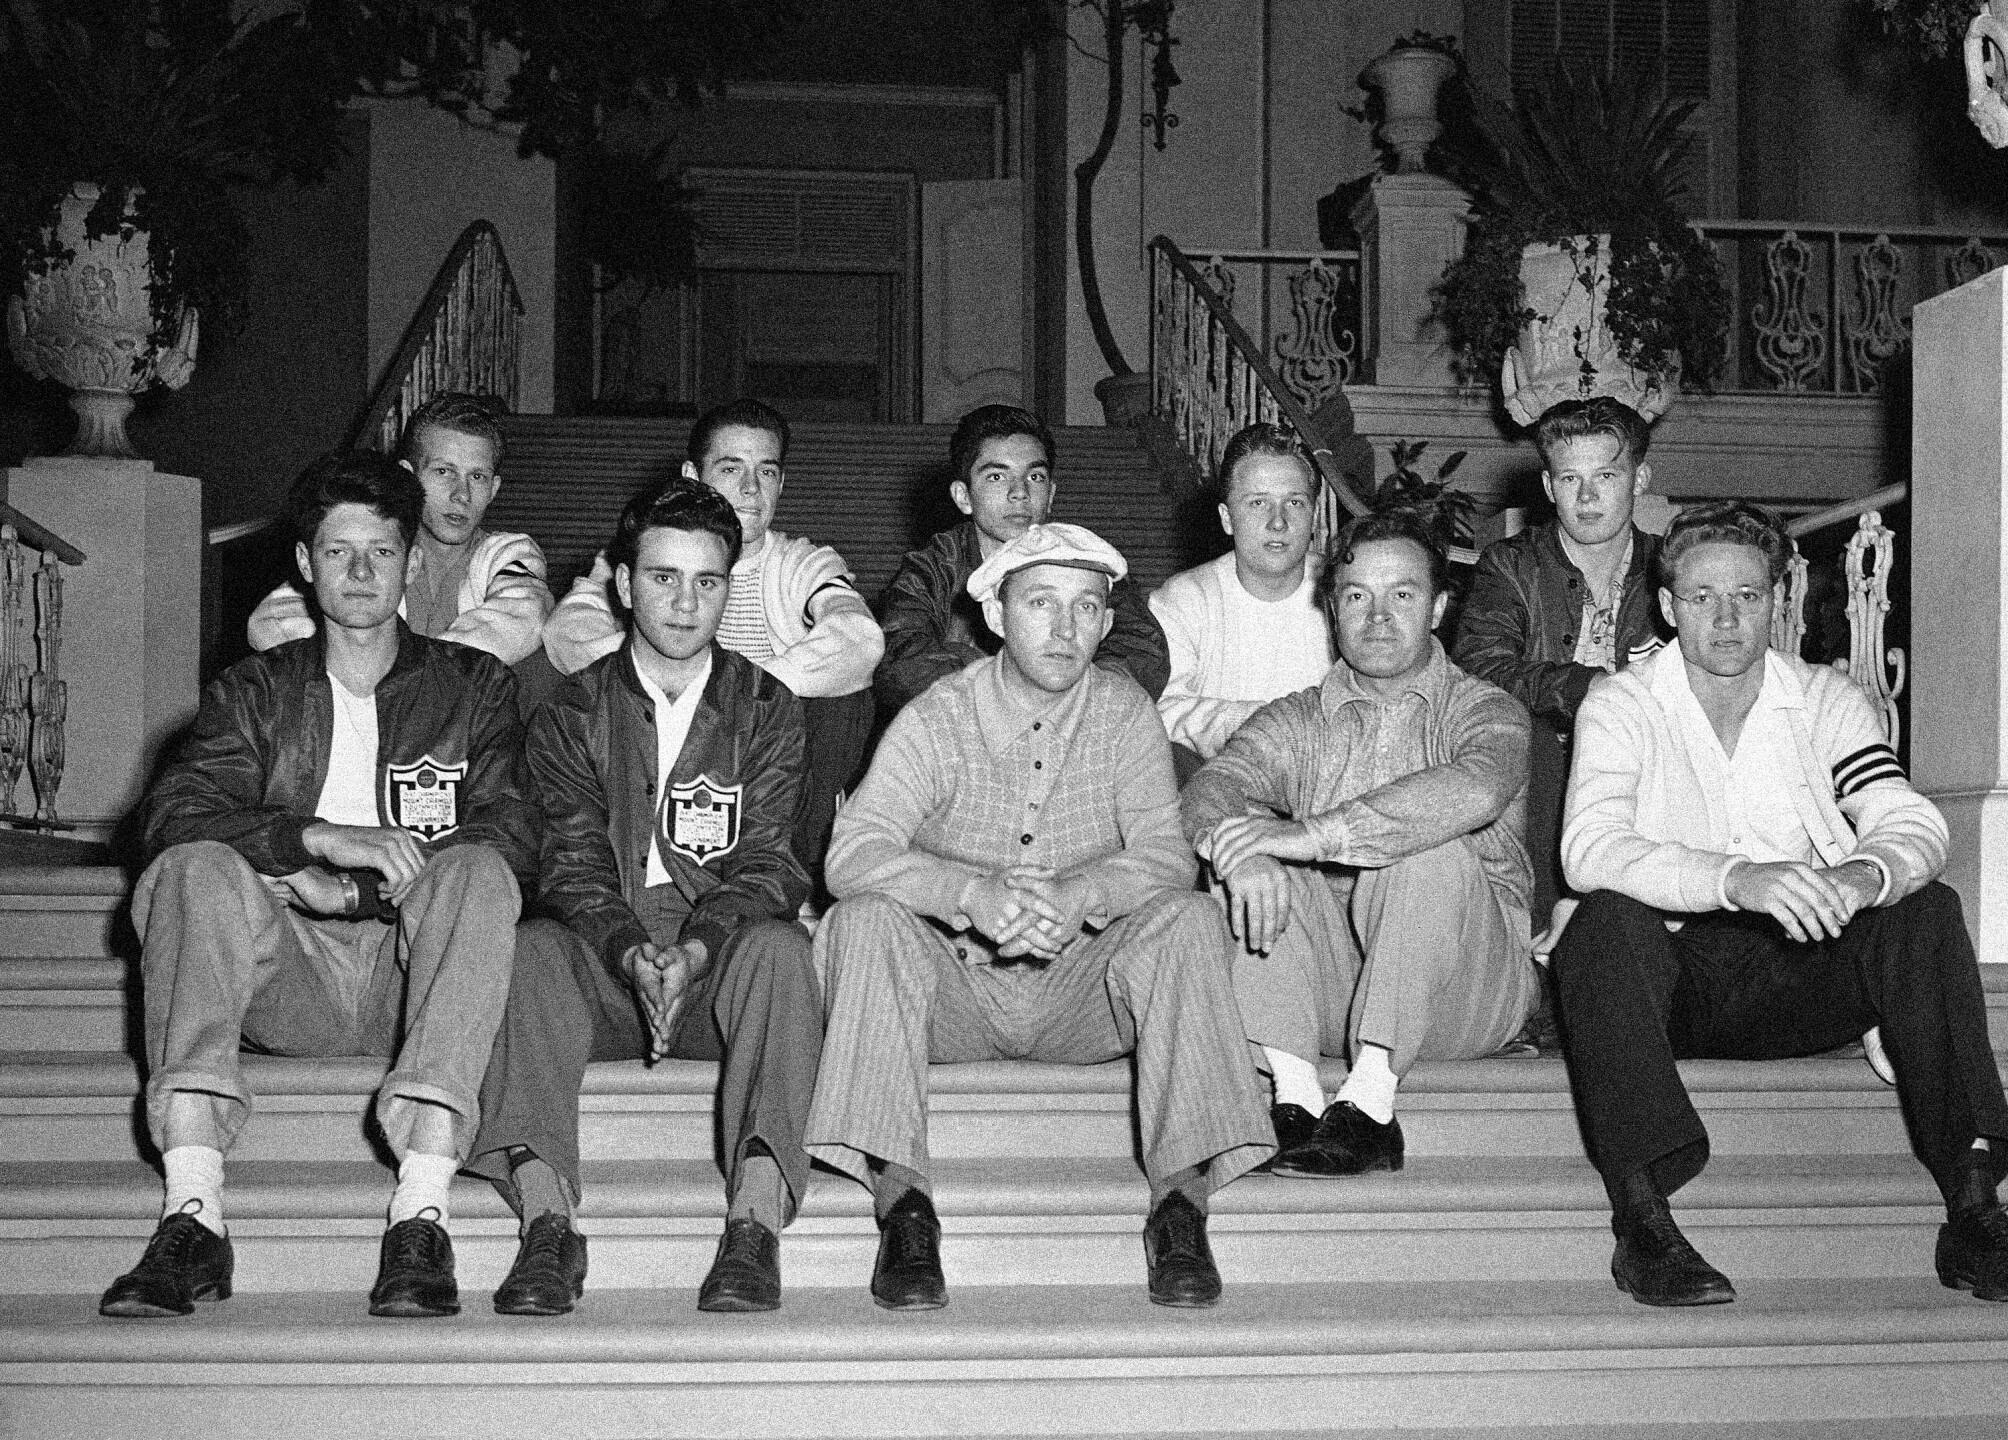 Bob Hope, Bing Crosby